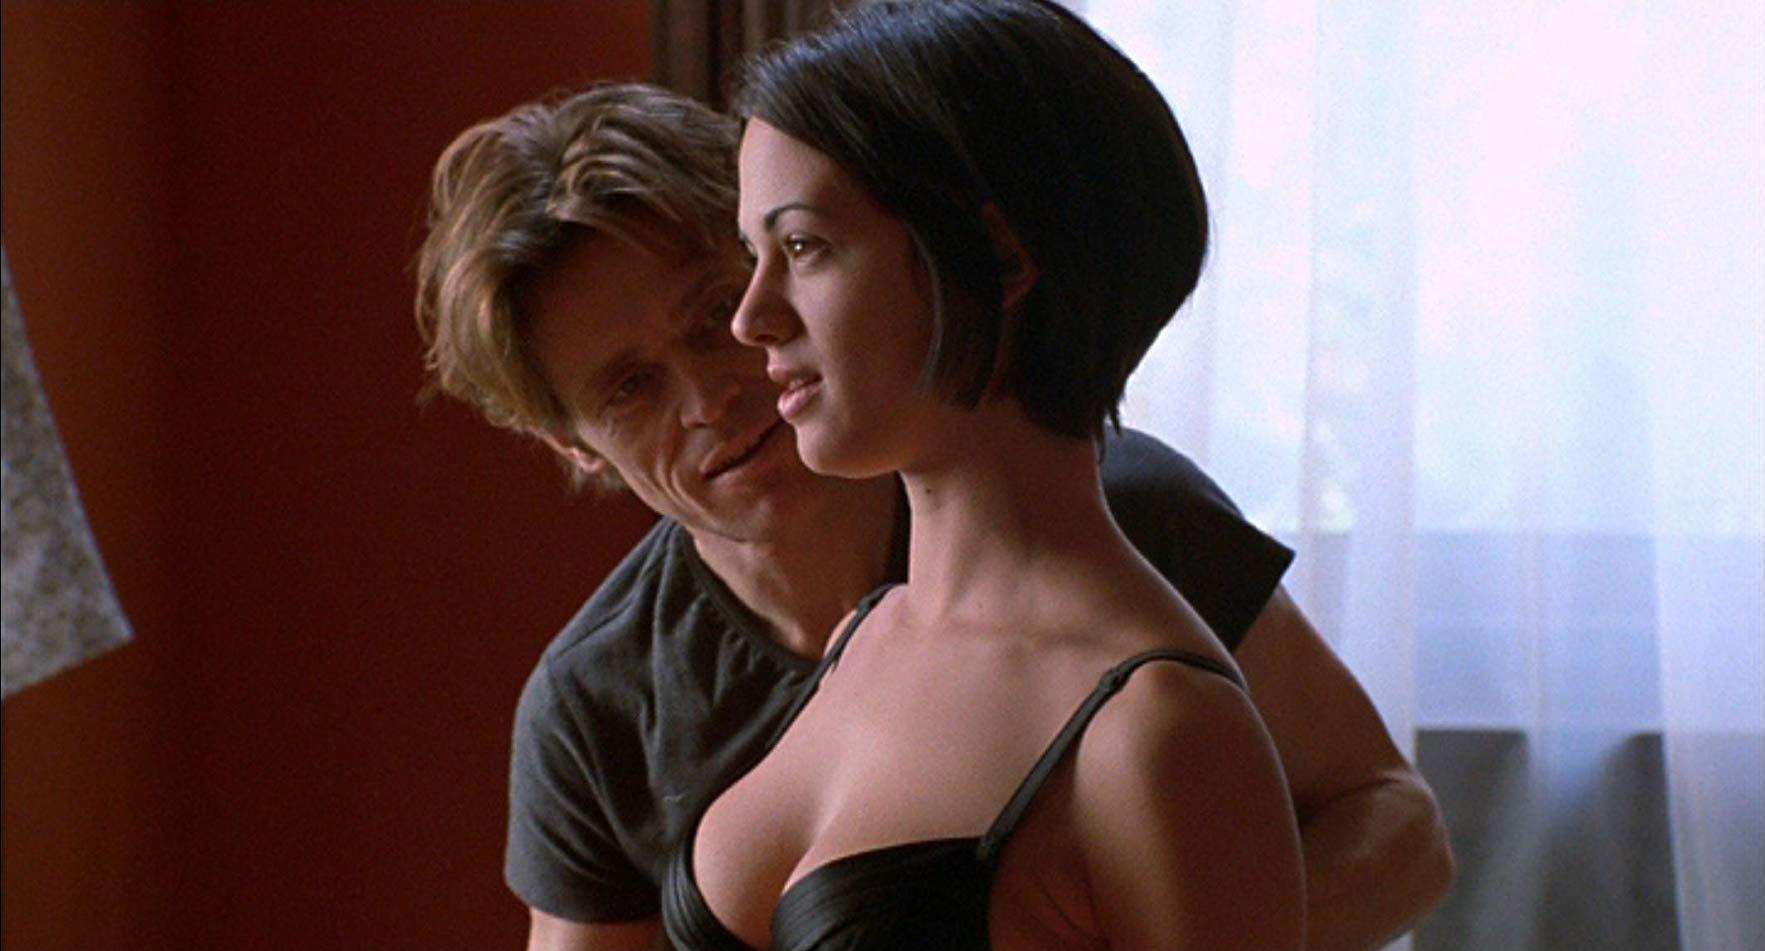 Willem DaFoe introduces Sandii (Asia Argento) in New Rose Hotel (1998)